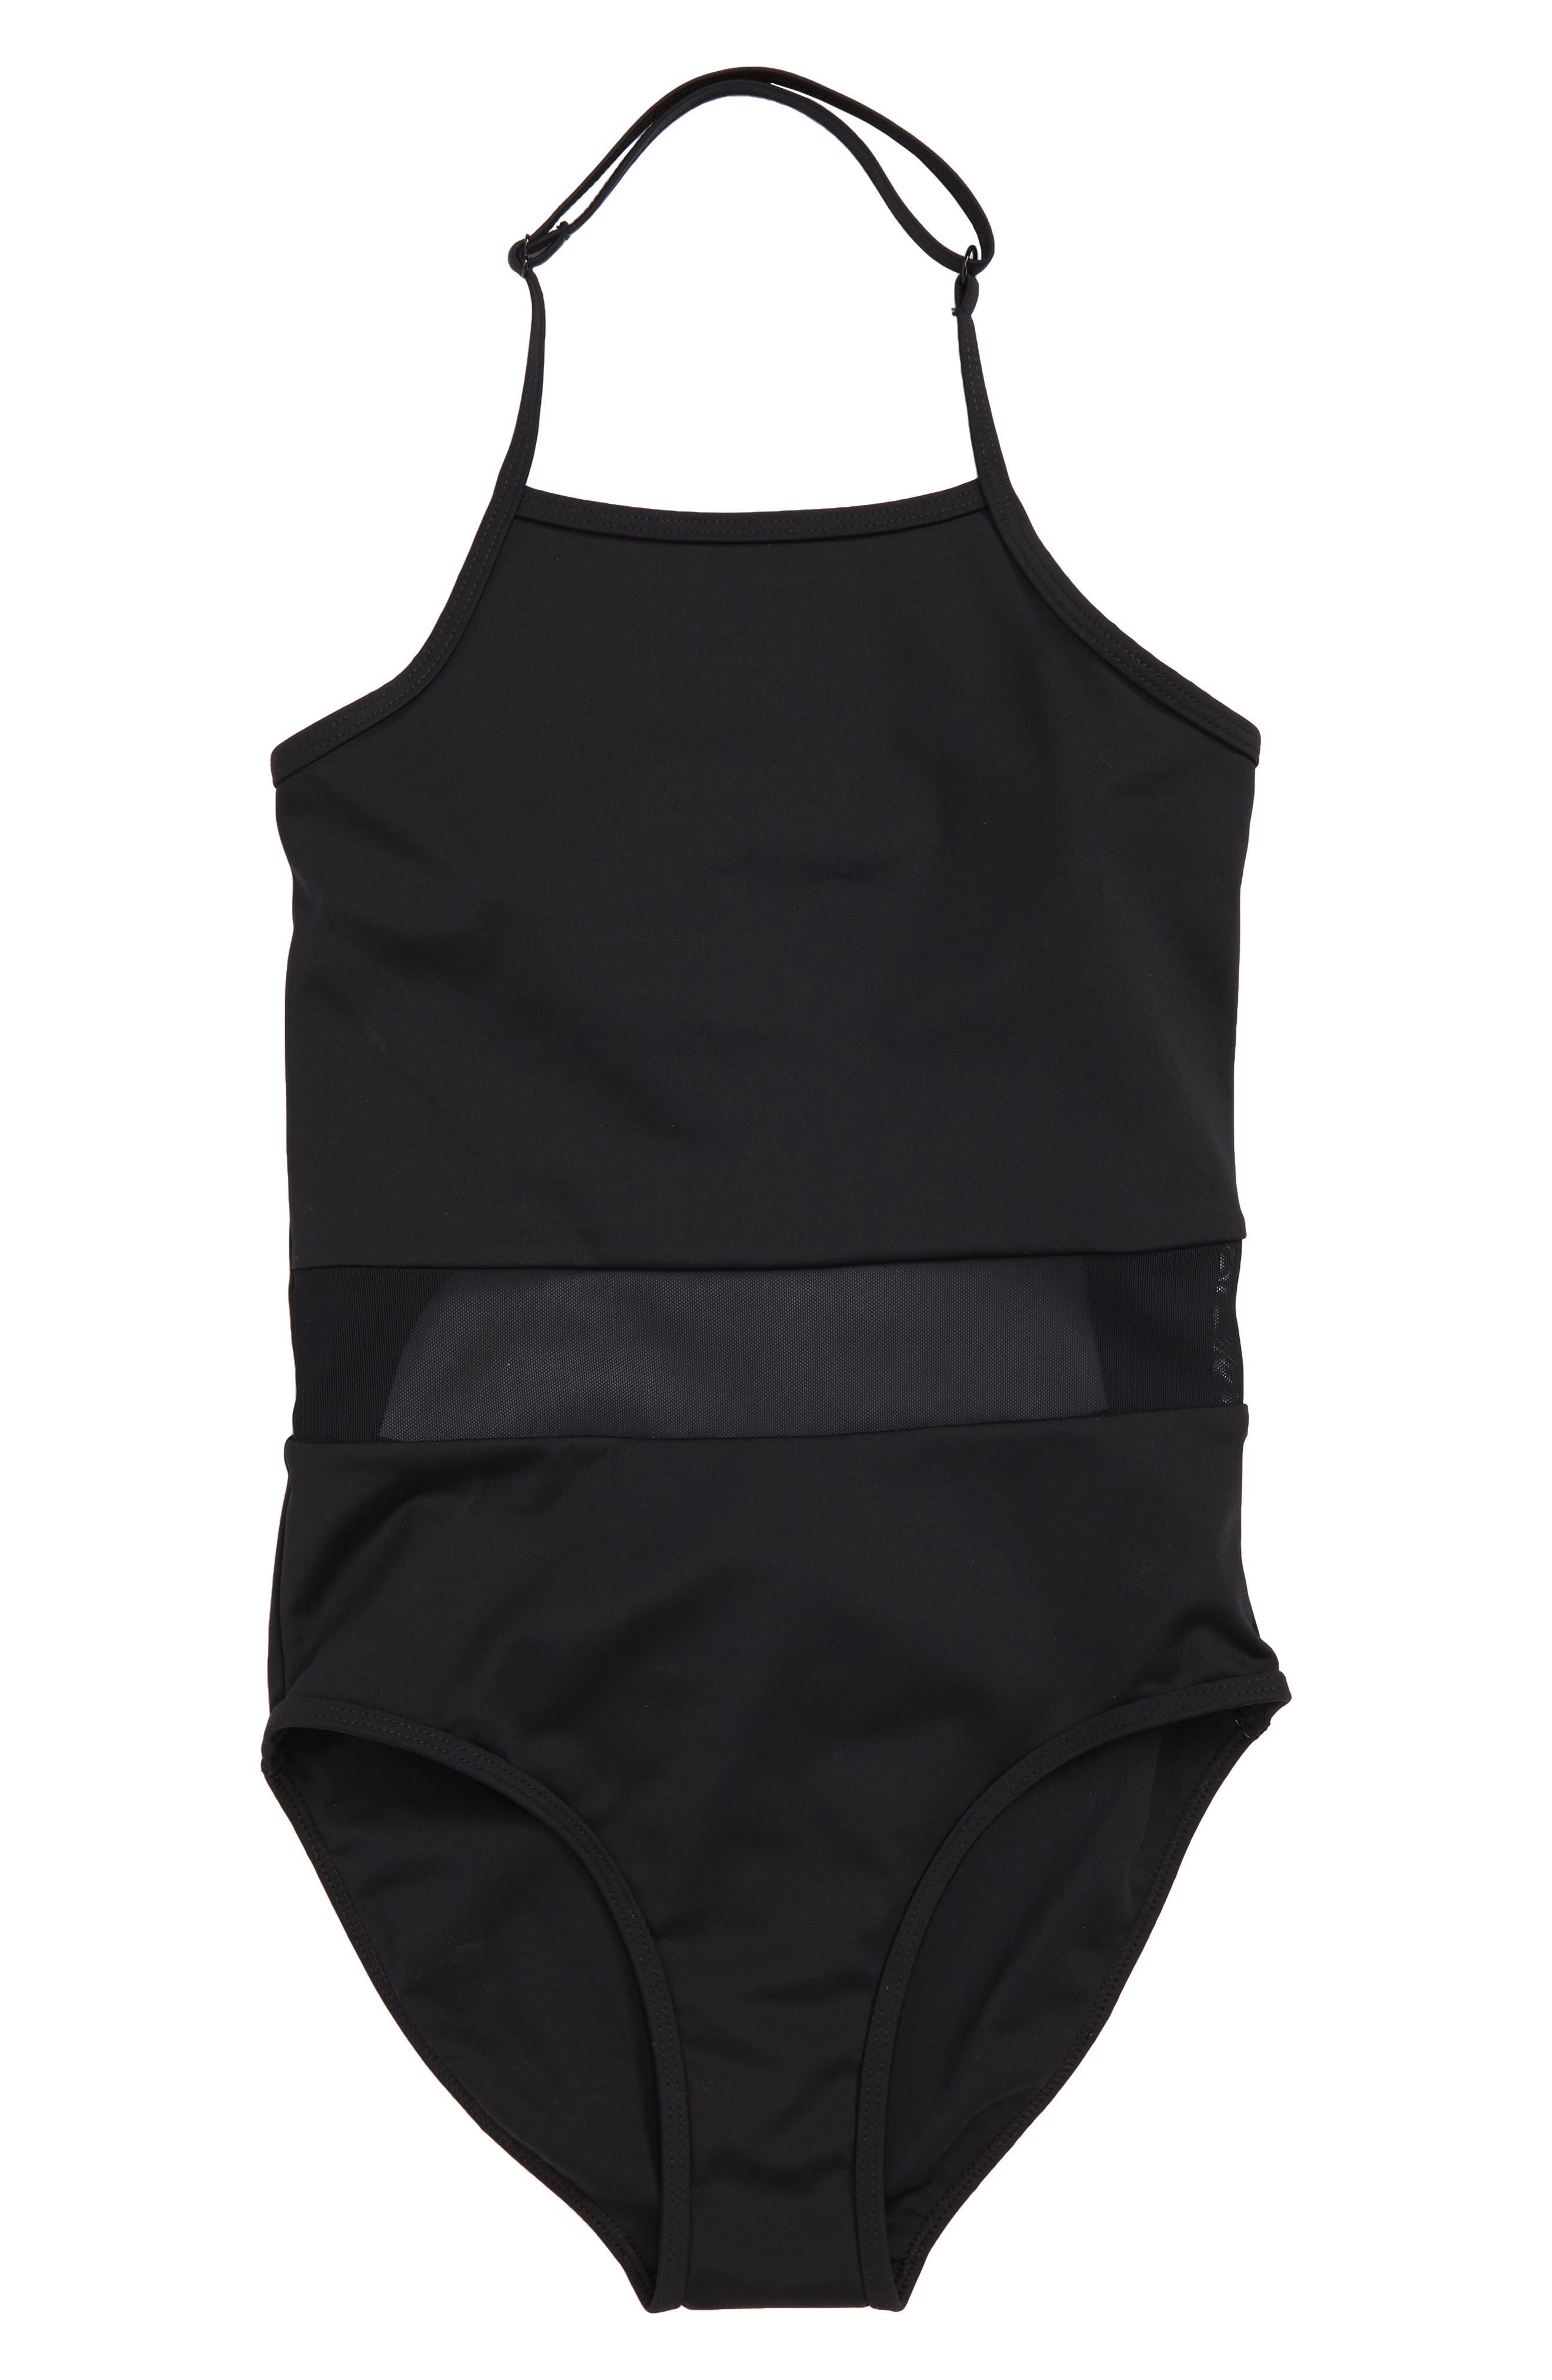 Horizon Mesh Inset One-Piece Swimsuit,                             Main thumbnail 1, color,                             001